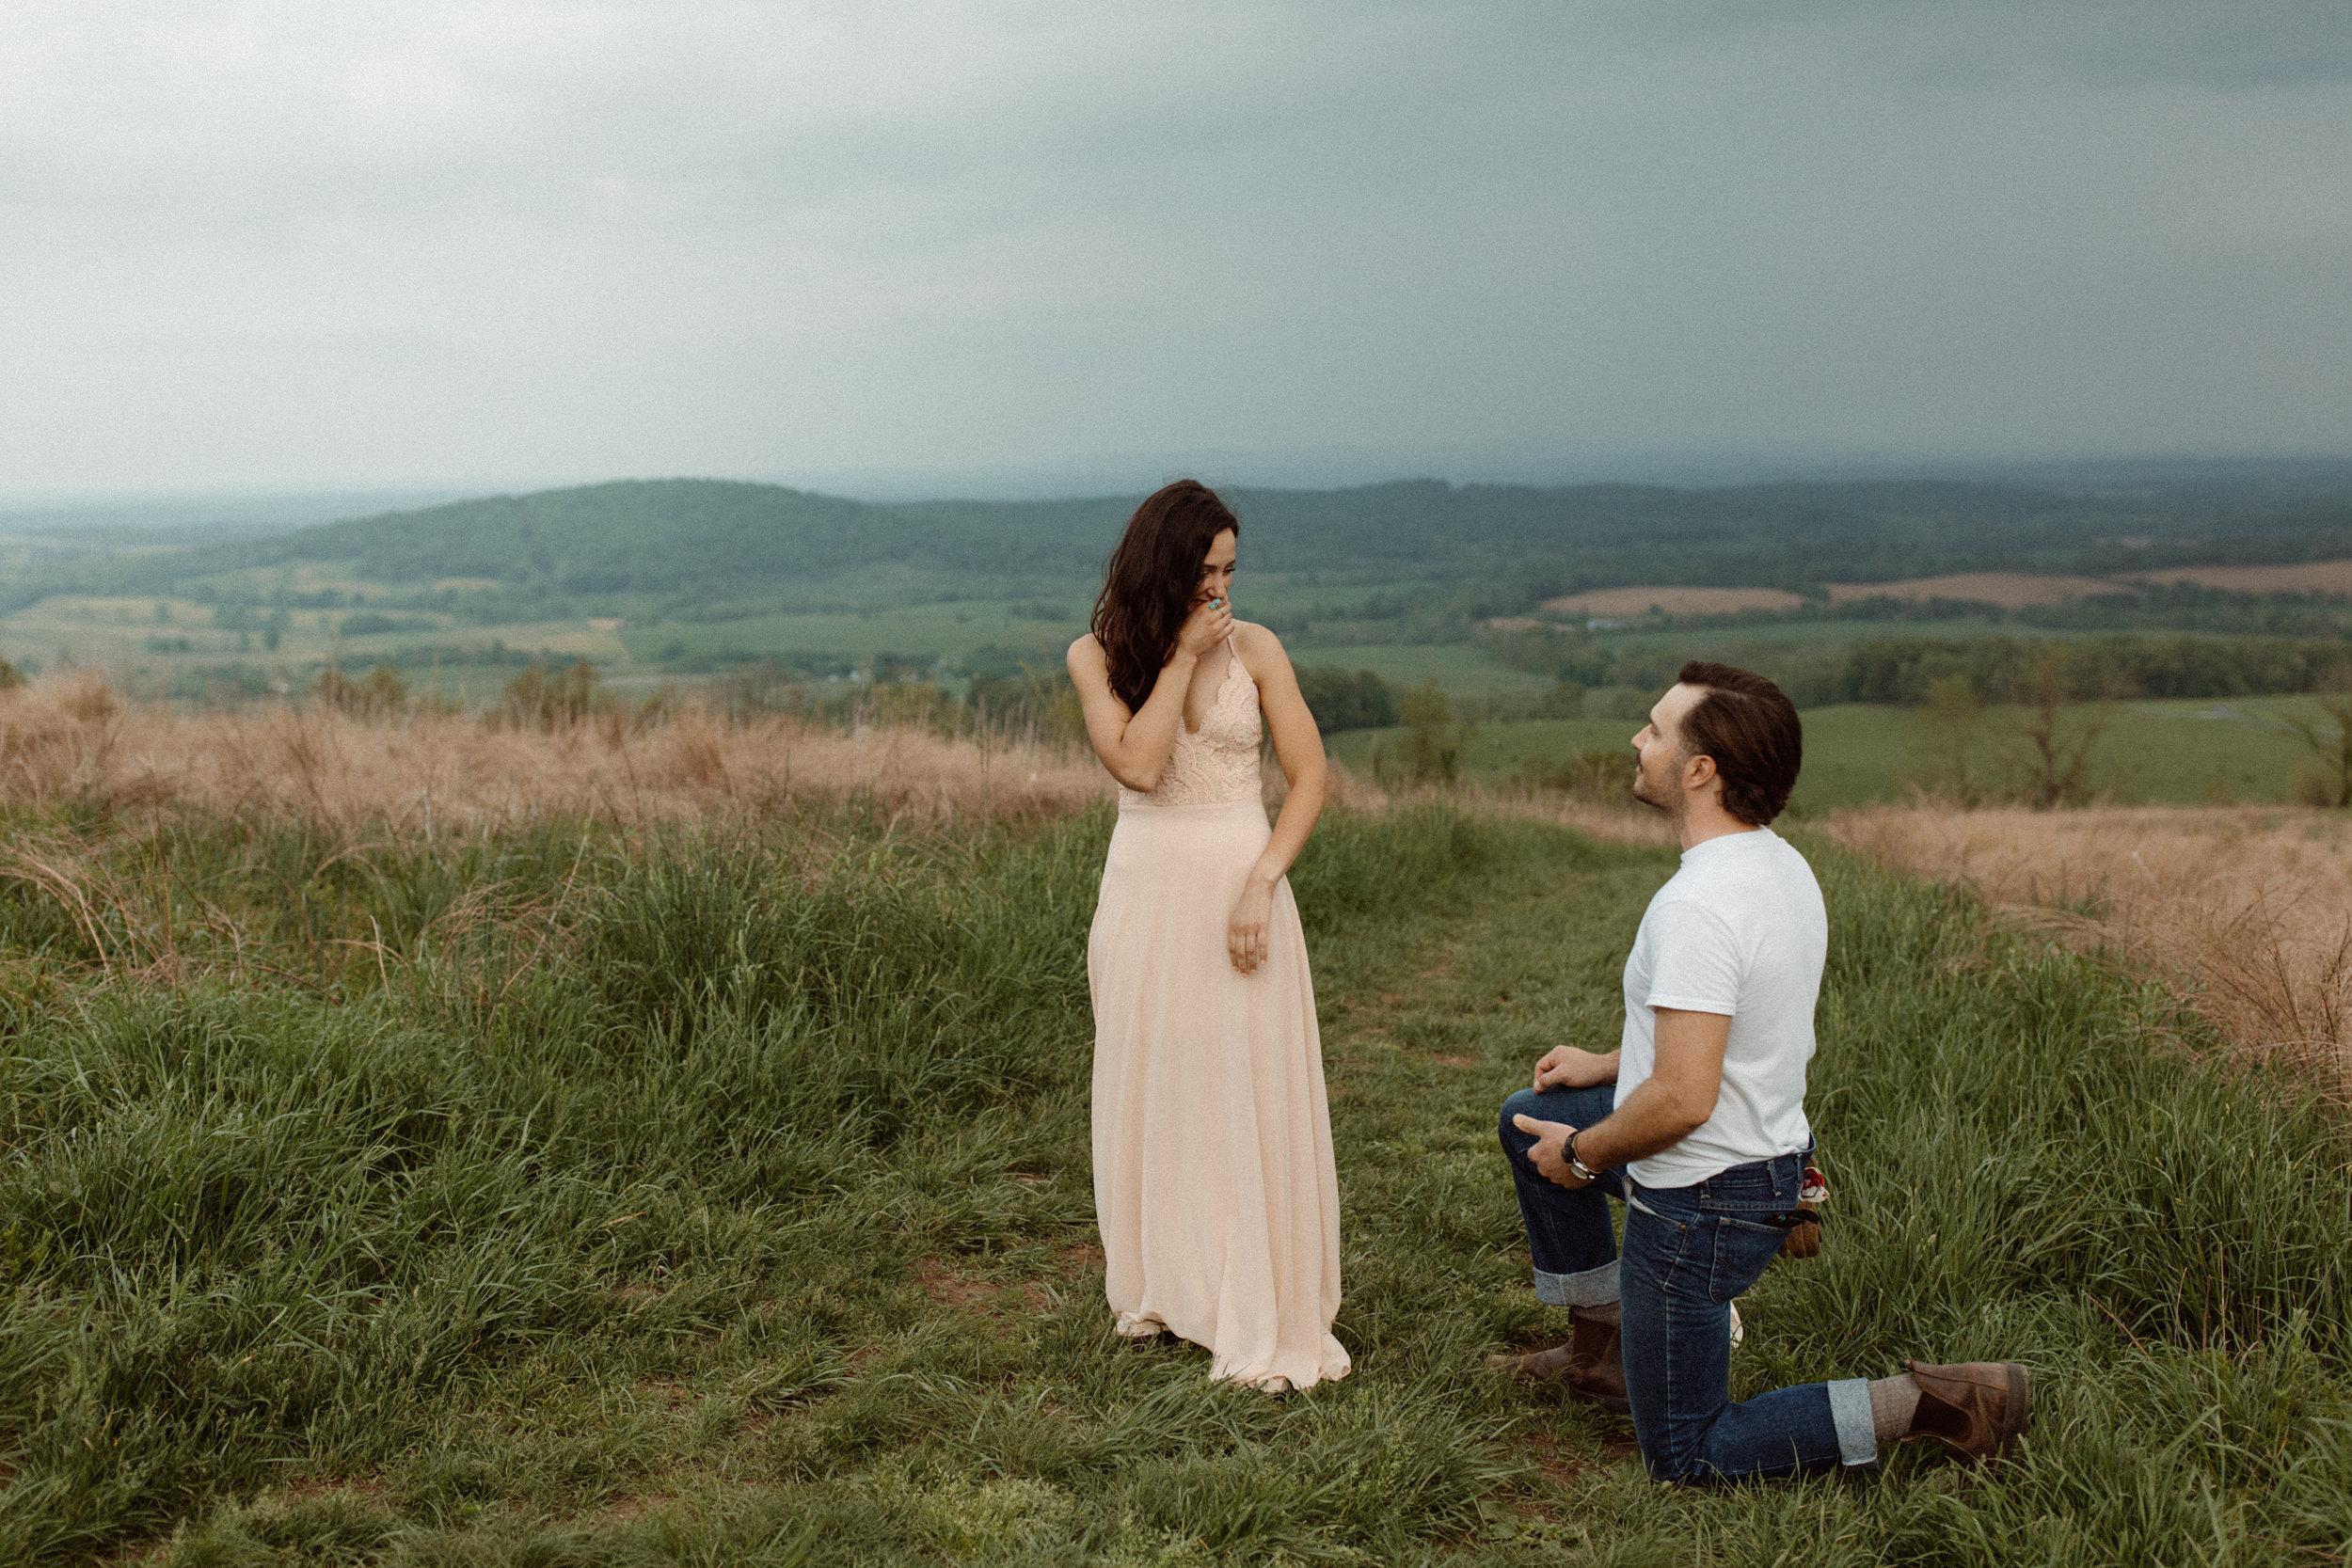 kelsey&mark-engagement-skymeadows-2019-peytoncurry-9773.jpg